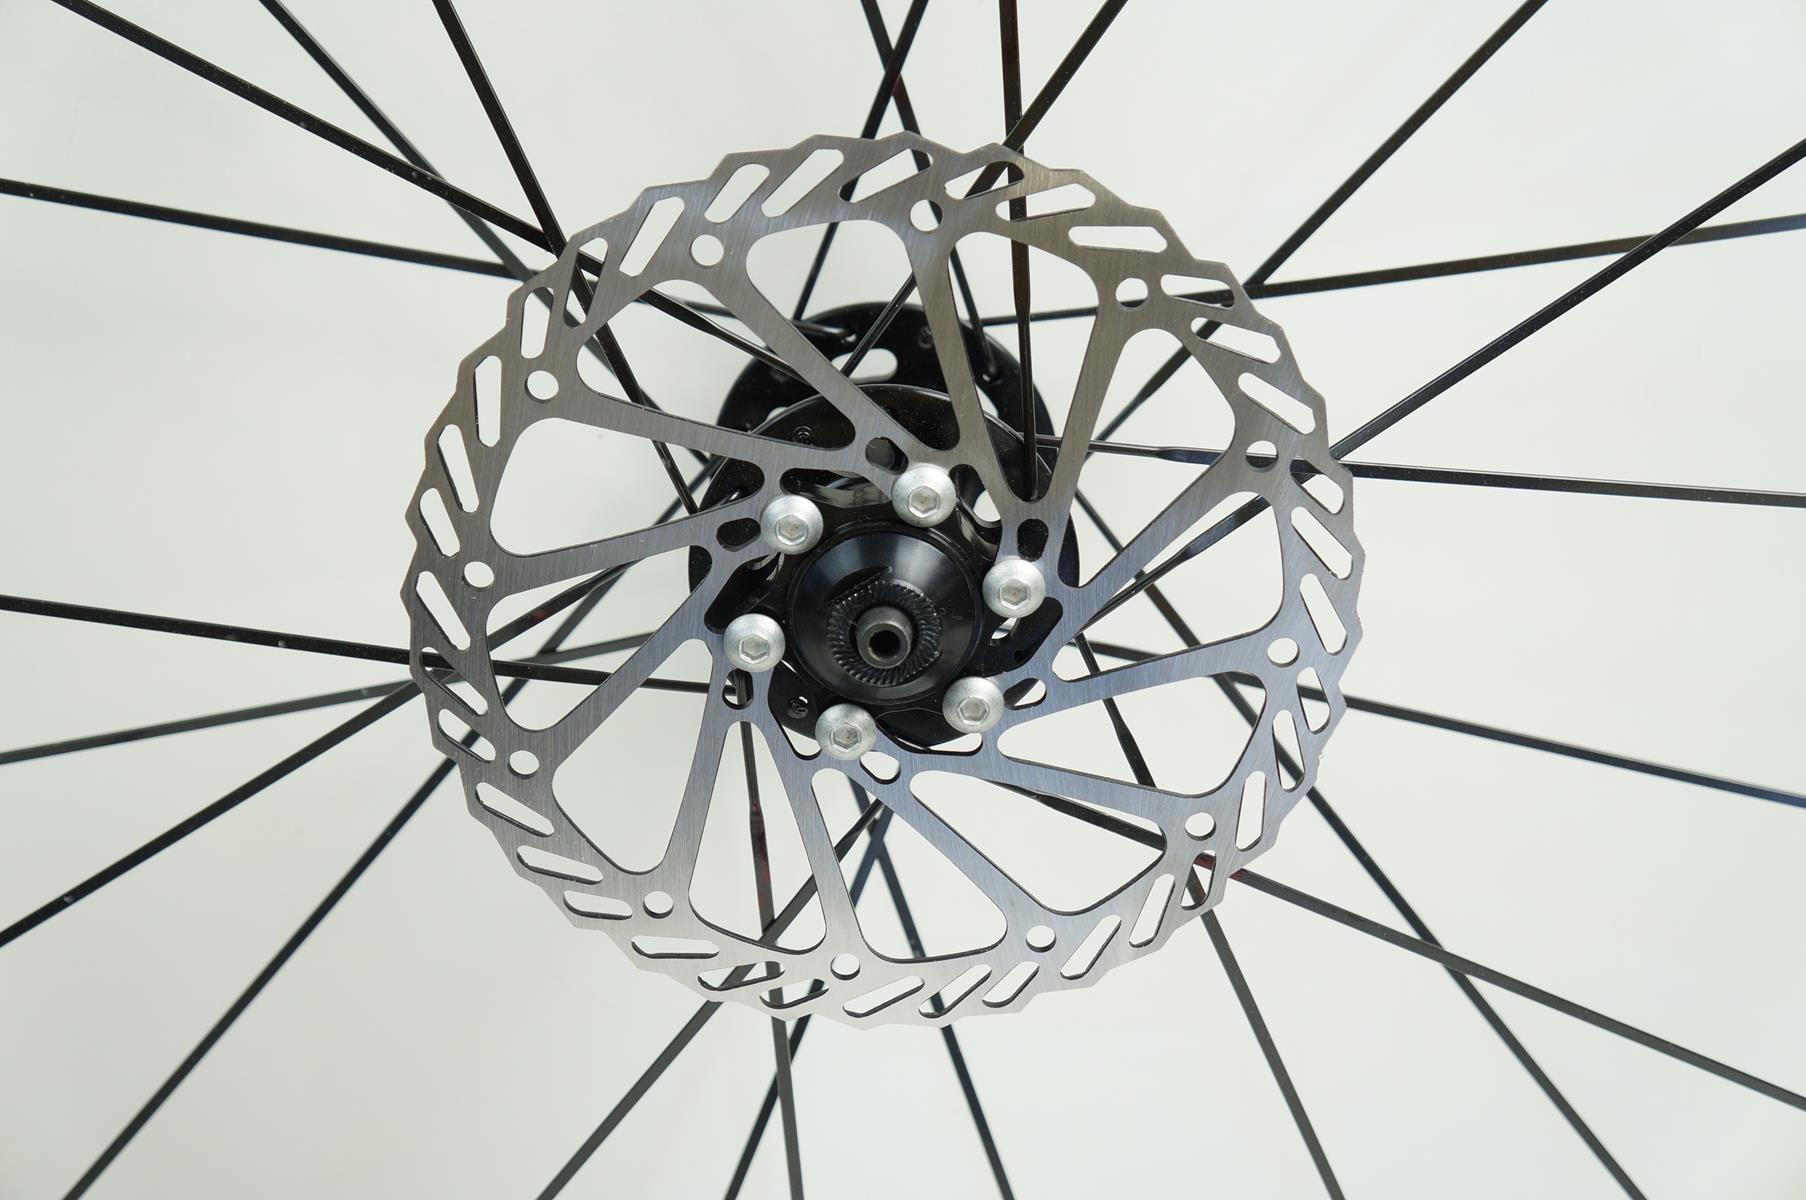 Rodas Vicinitech XM 1800 Disc Aro 29 Alumino Eixo 9 Preta com Cubo Preto